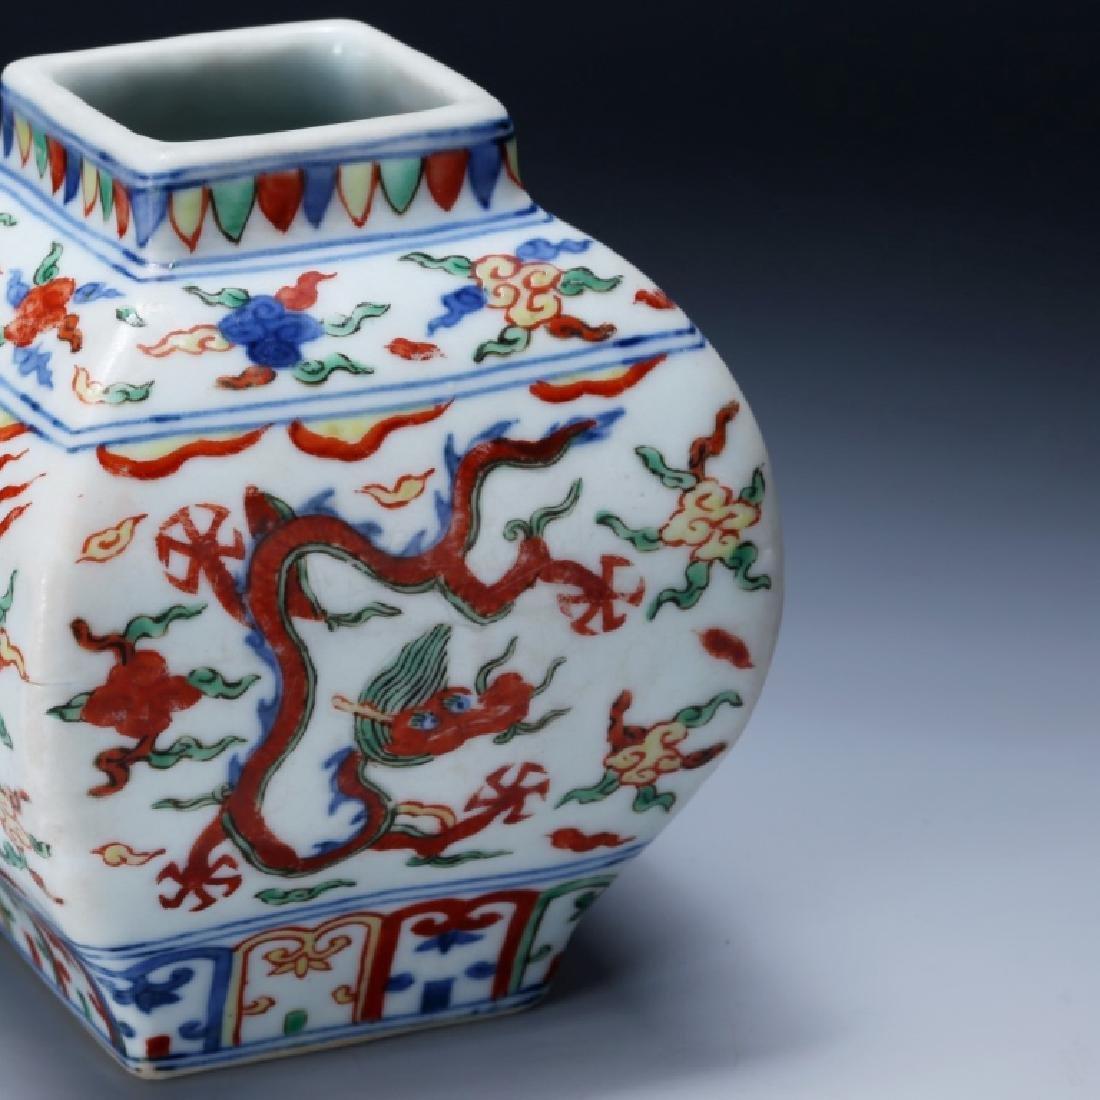 Chinese Qing Dynasty Wucai Porcelain Jar - 6